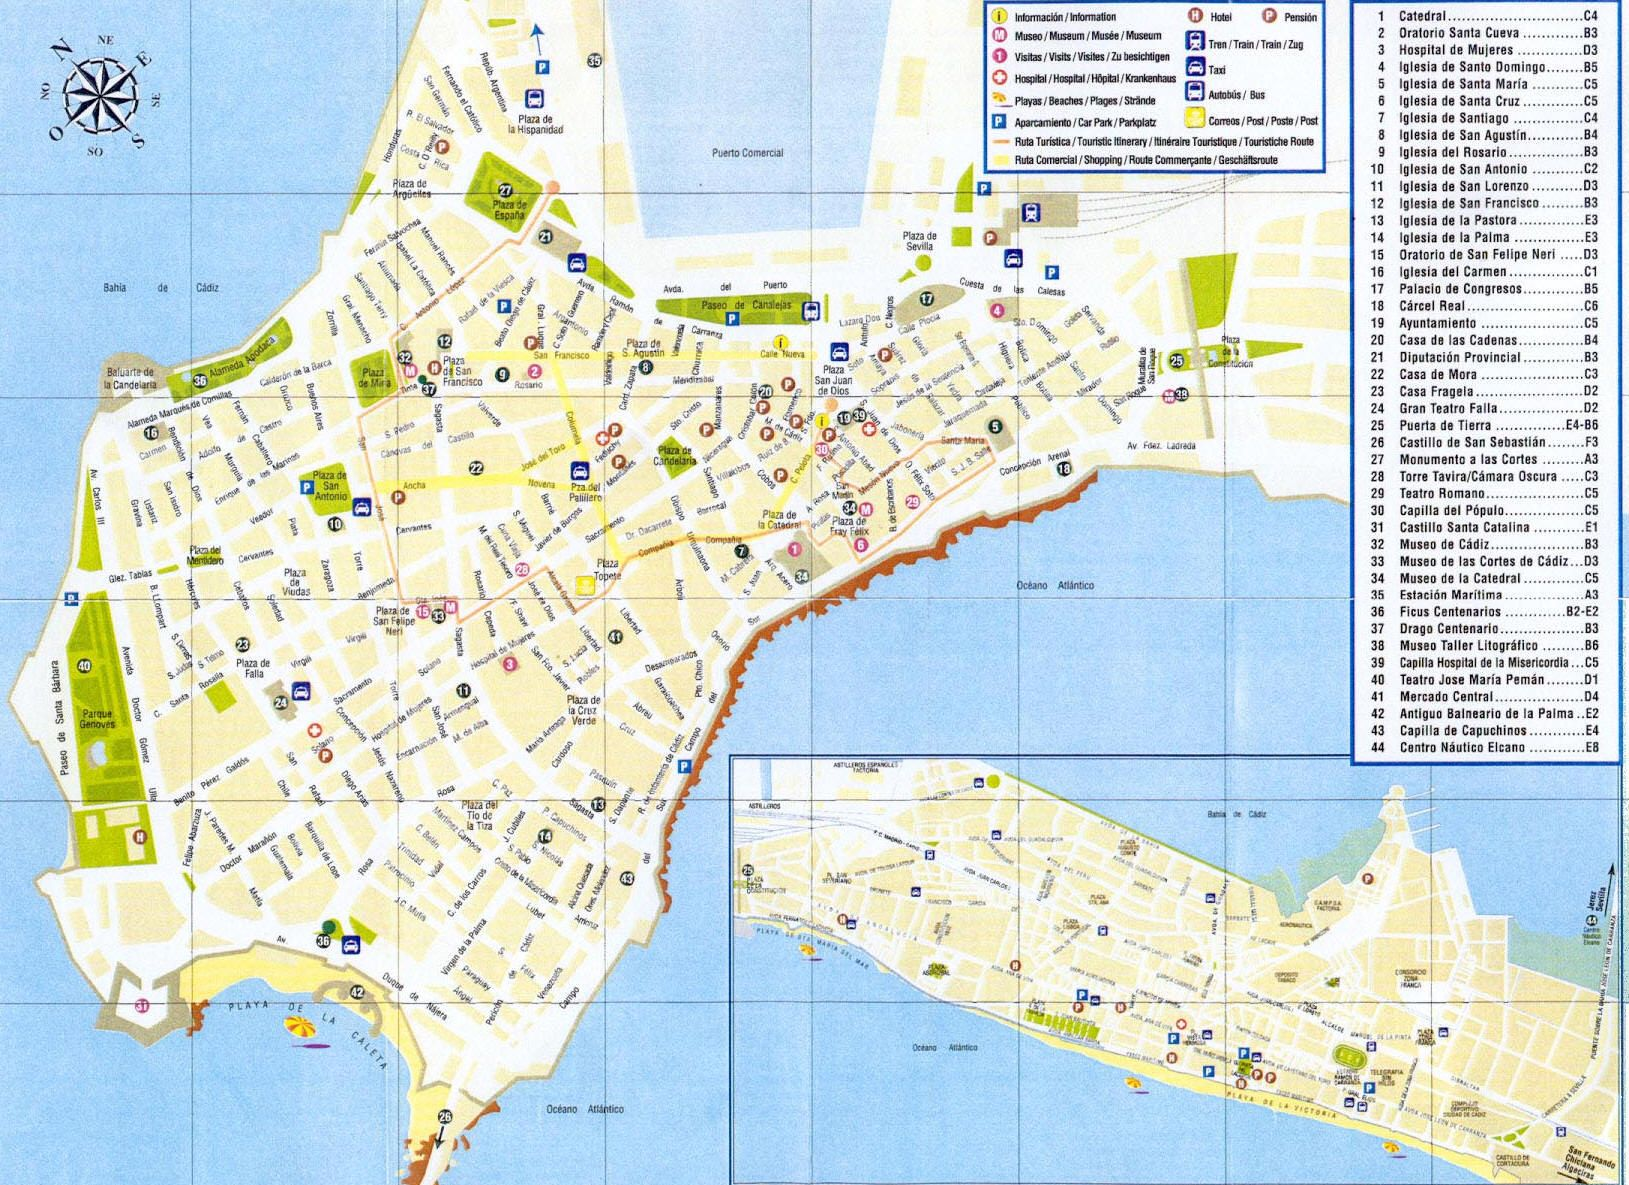 Cartina Mappa Spagna.Mappa Cadice Cartina Di Cadice In Spagna Cadice Mappa Spagna